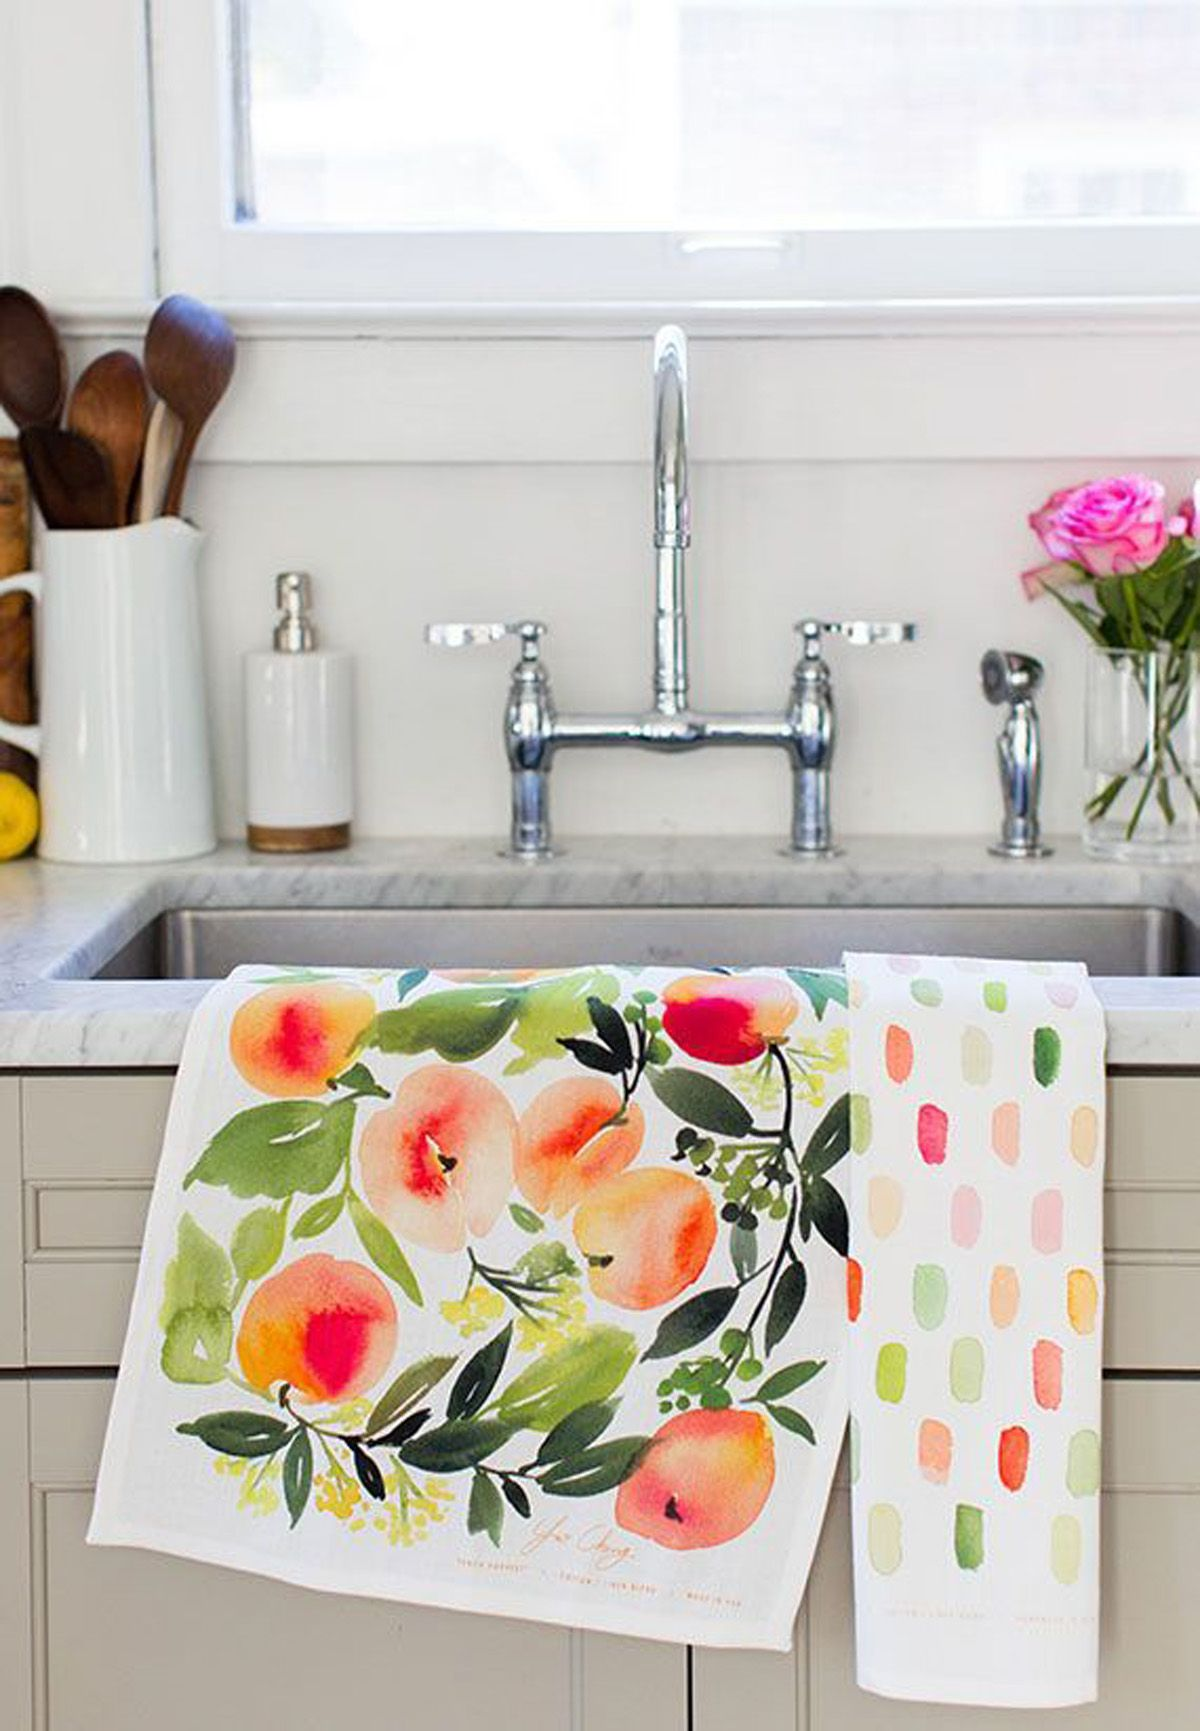 Relooker une cuisine en 10 idées de décoration in 2020 | Tea towels diy, Tea towels, Towels design